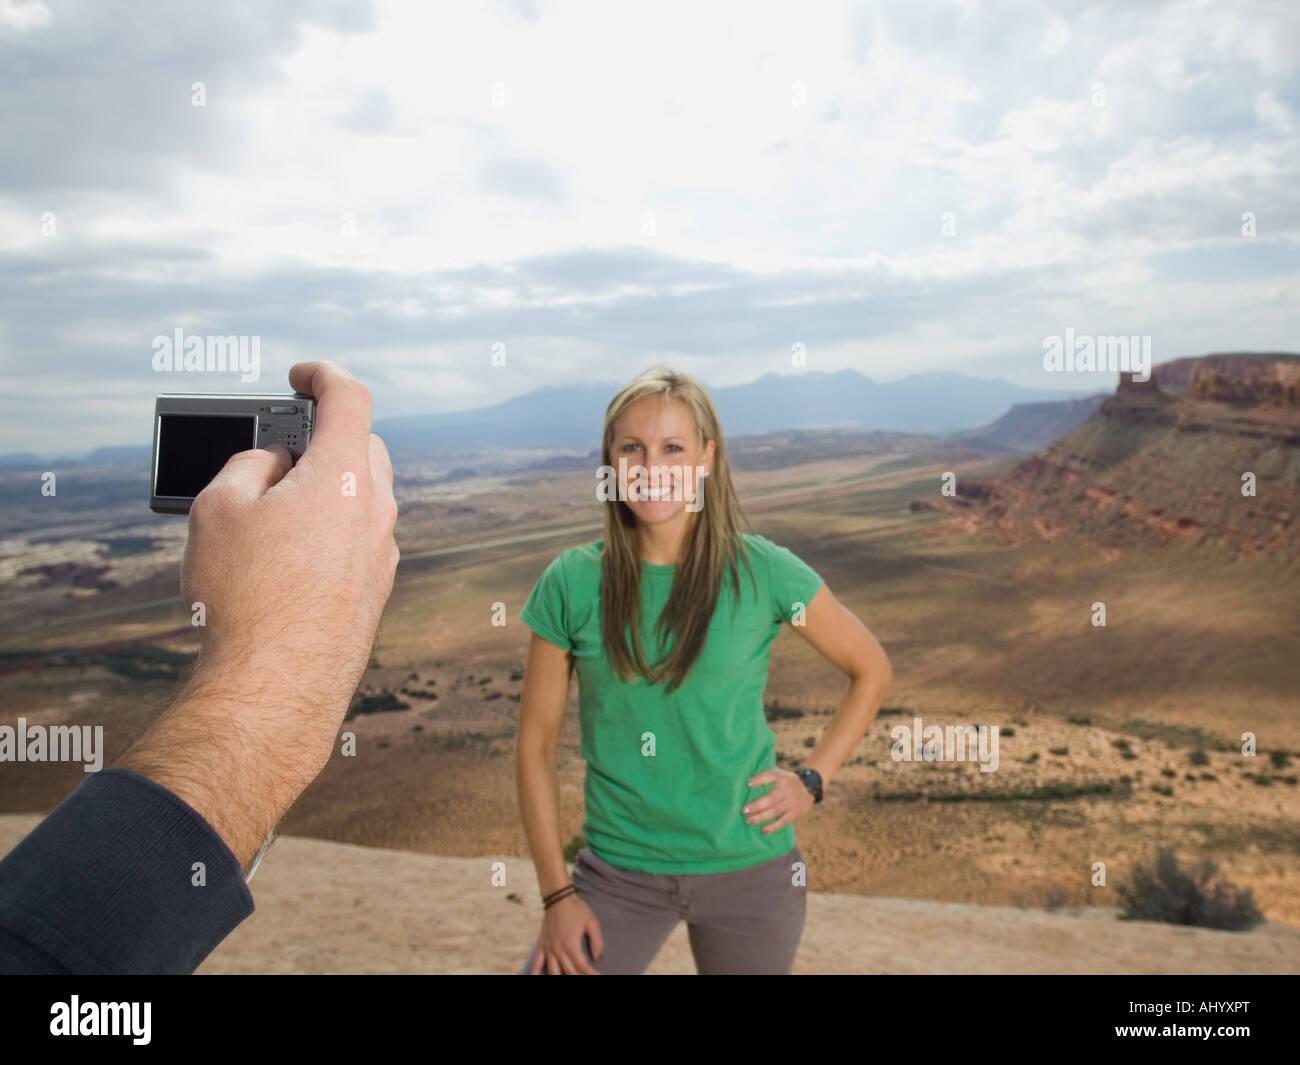 Woman having photograph taken - Stock Image